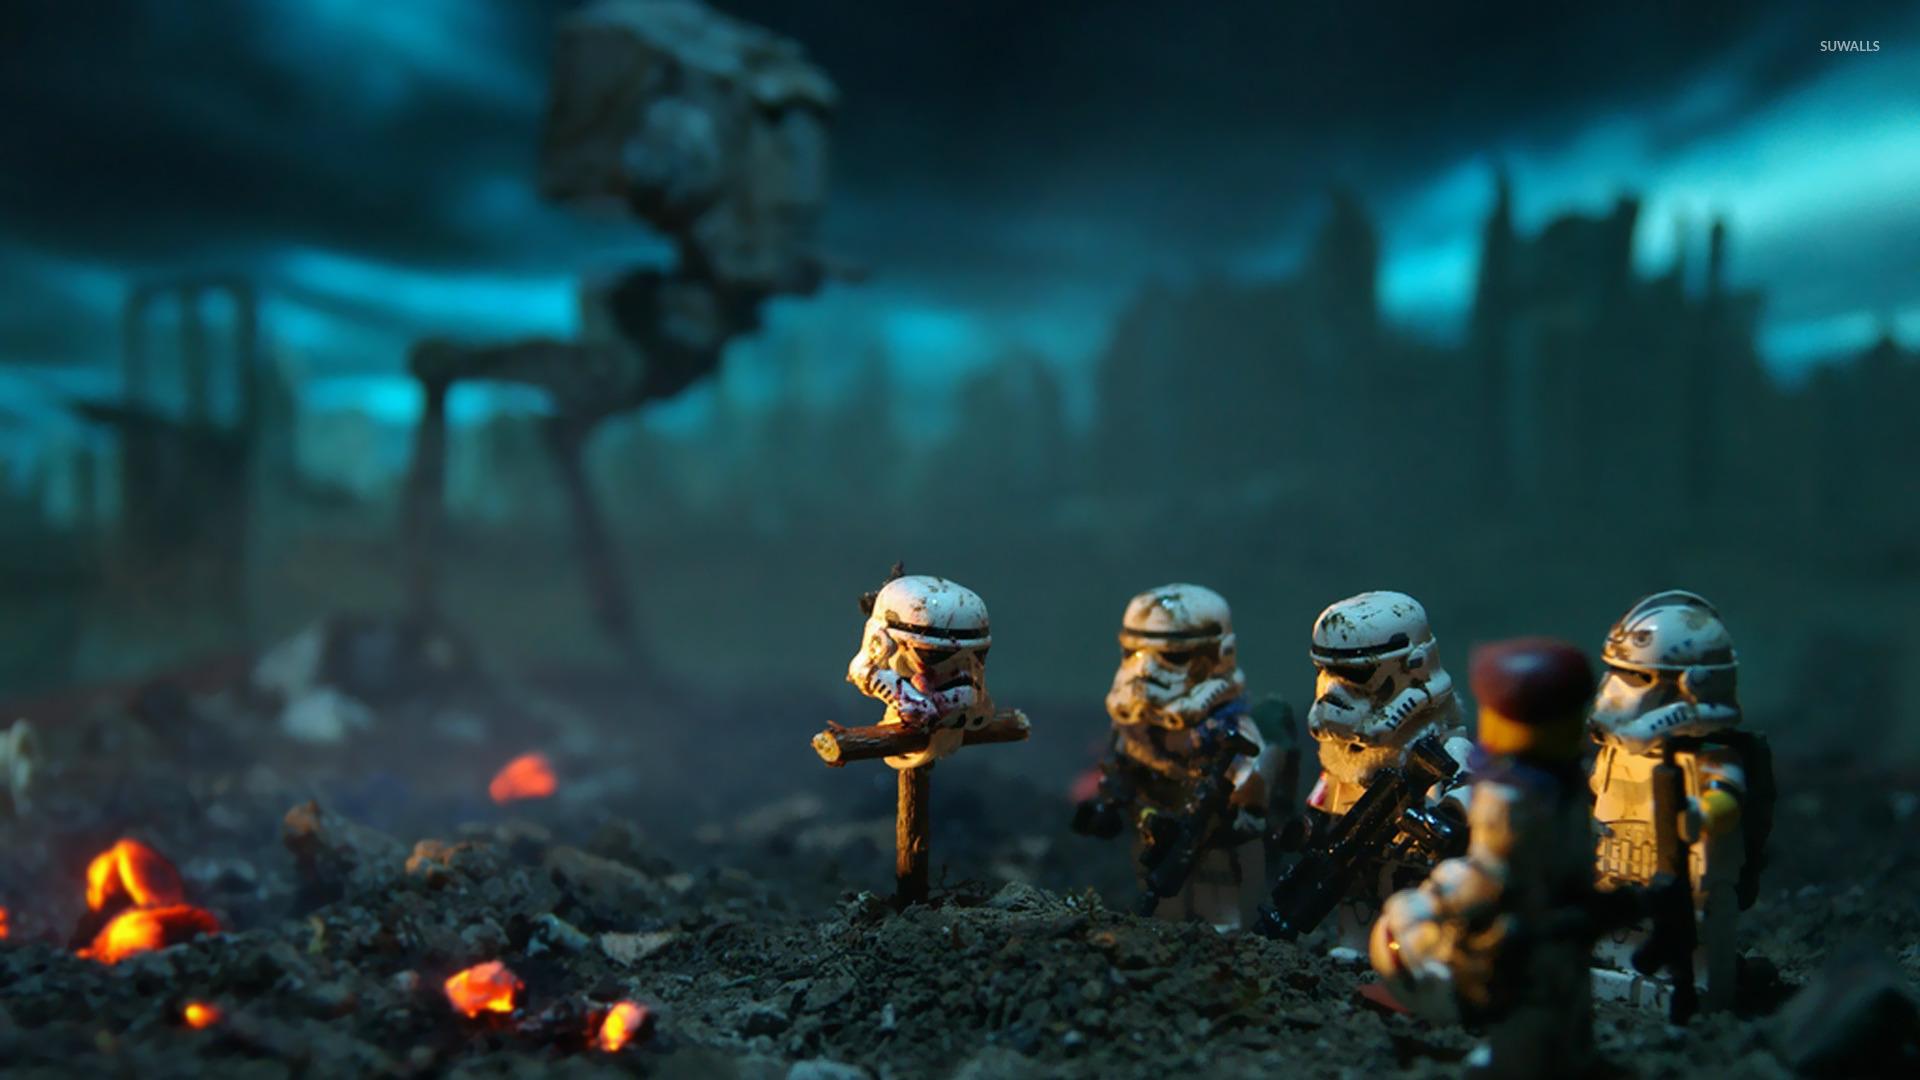 LEGO Stormtrooper burial wallpaper Artistic wallpapers 16113